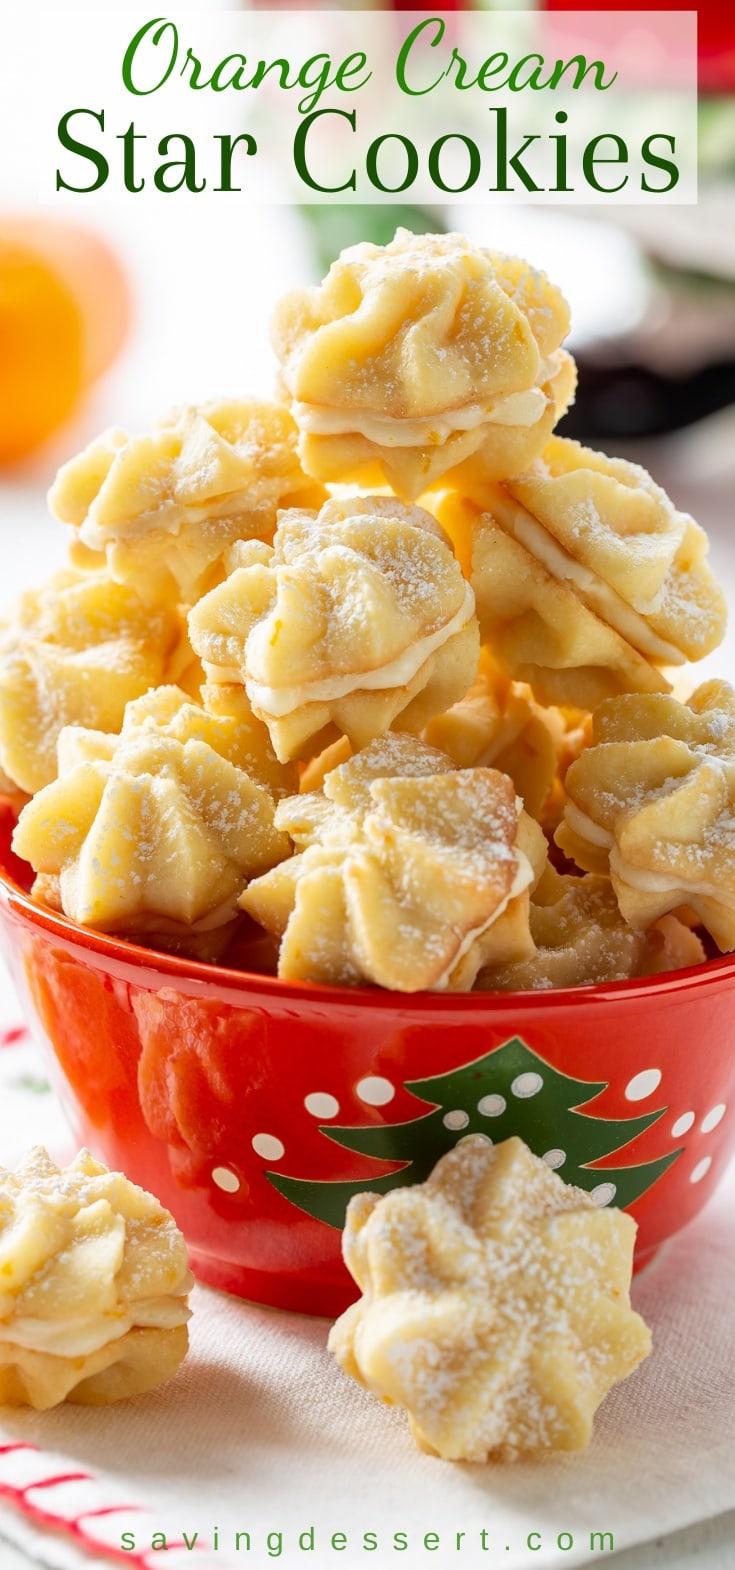 A Christmas bowl of orange cream star cookies